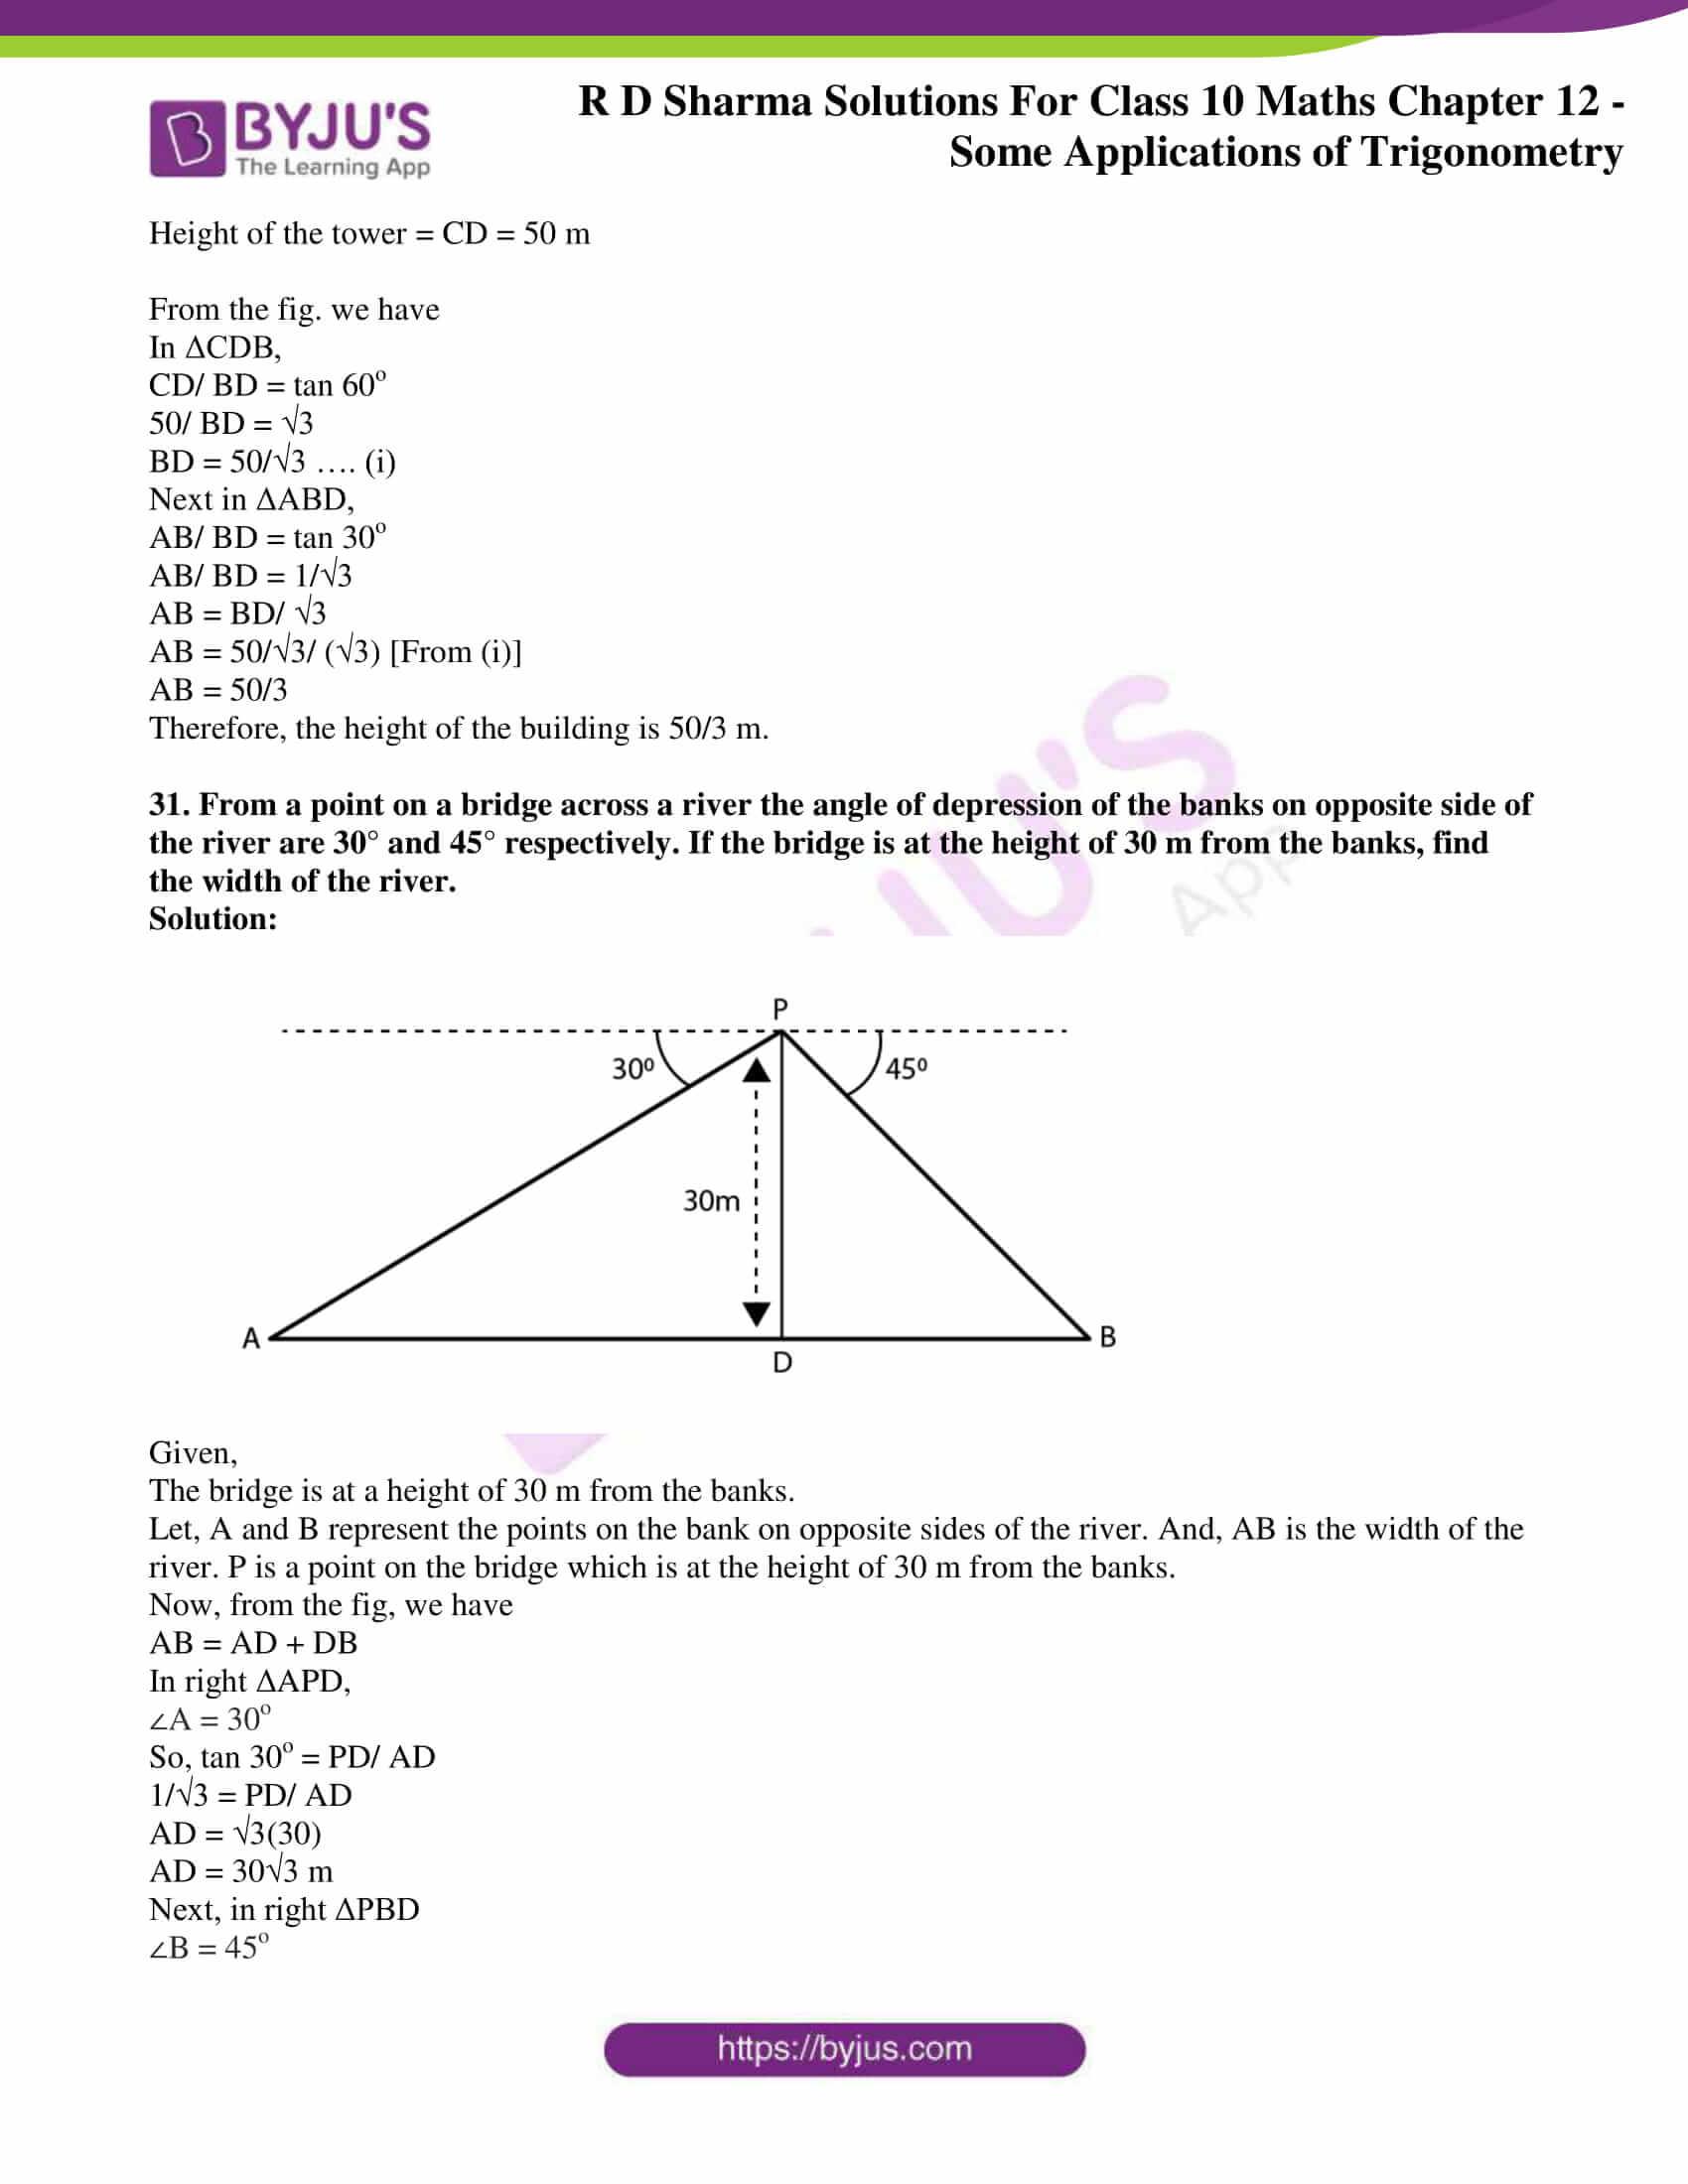 rd sharma class 10 chapter 12 applications trigonometry solutions 30